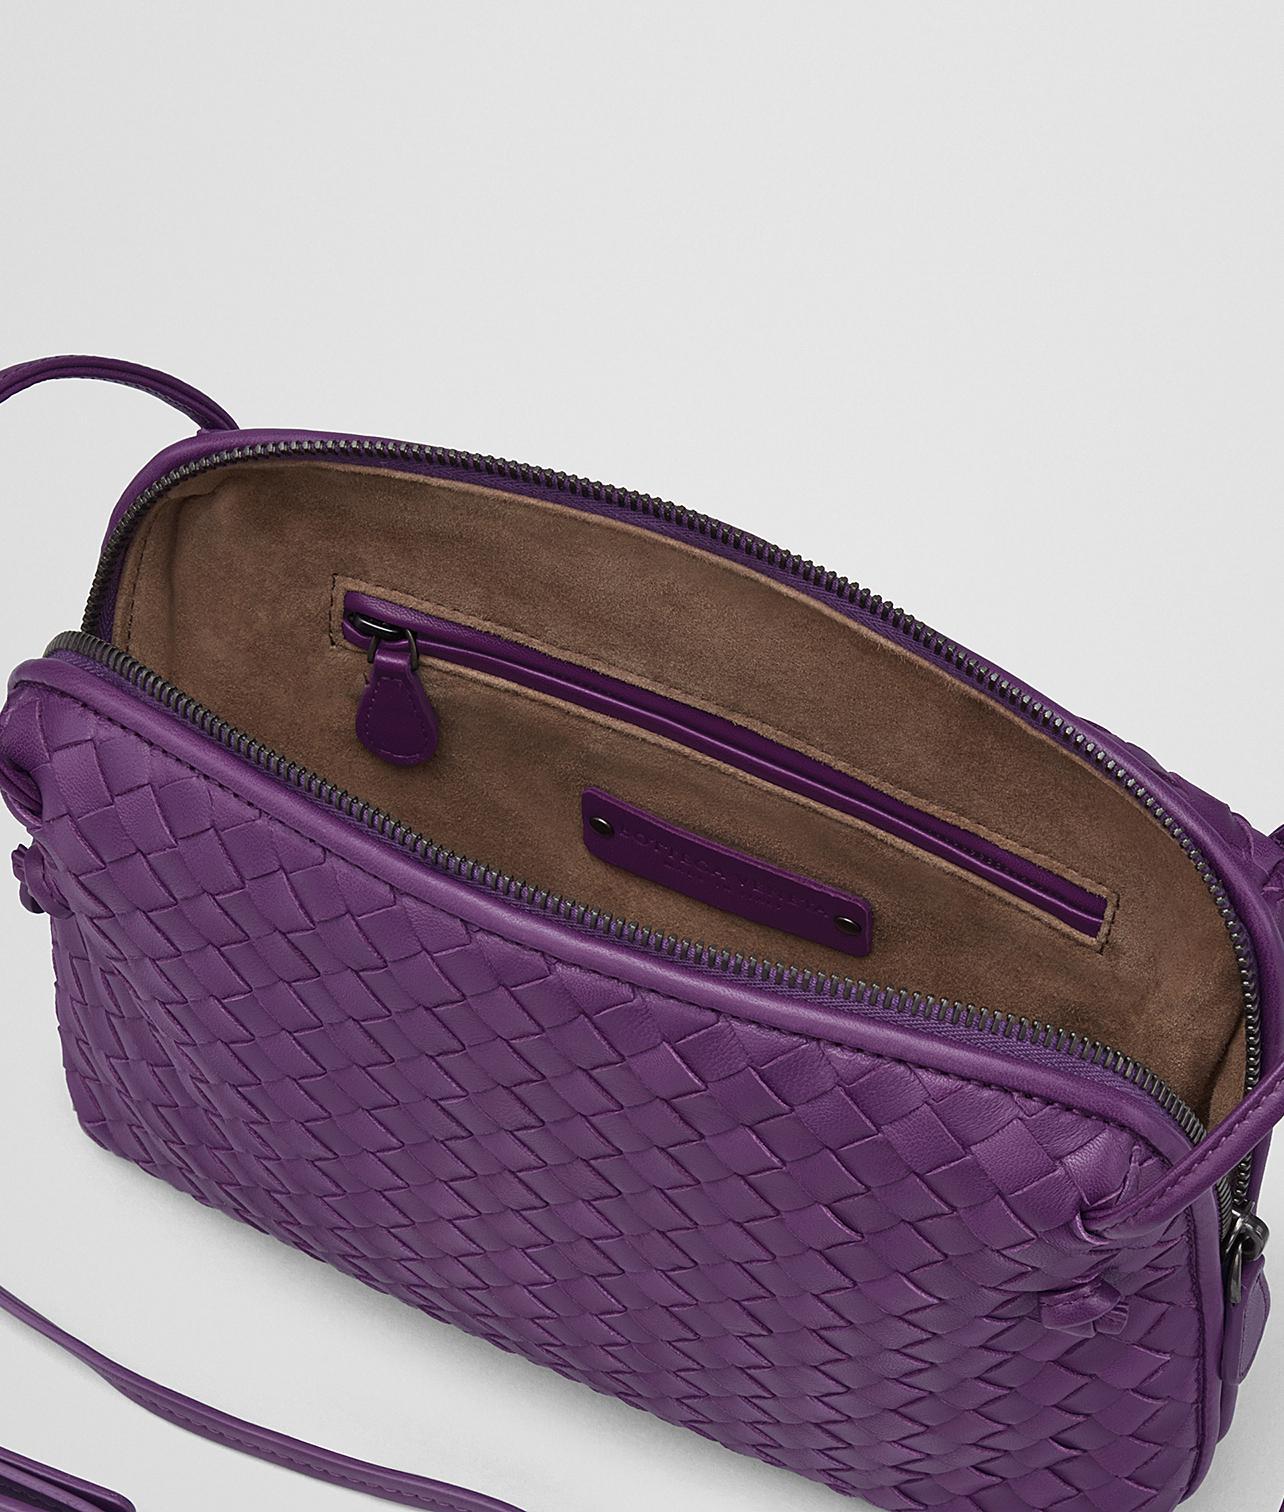 18ab01f664 Lyst - Bottega Veneta Monalisa Intrecciato Nappa Messenger in Purple